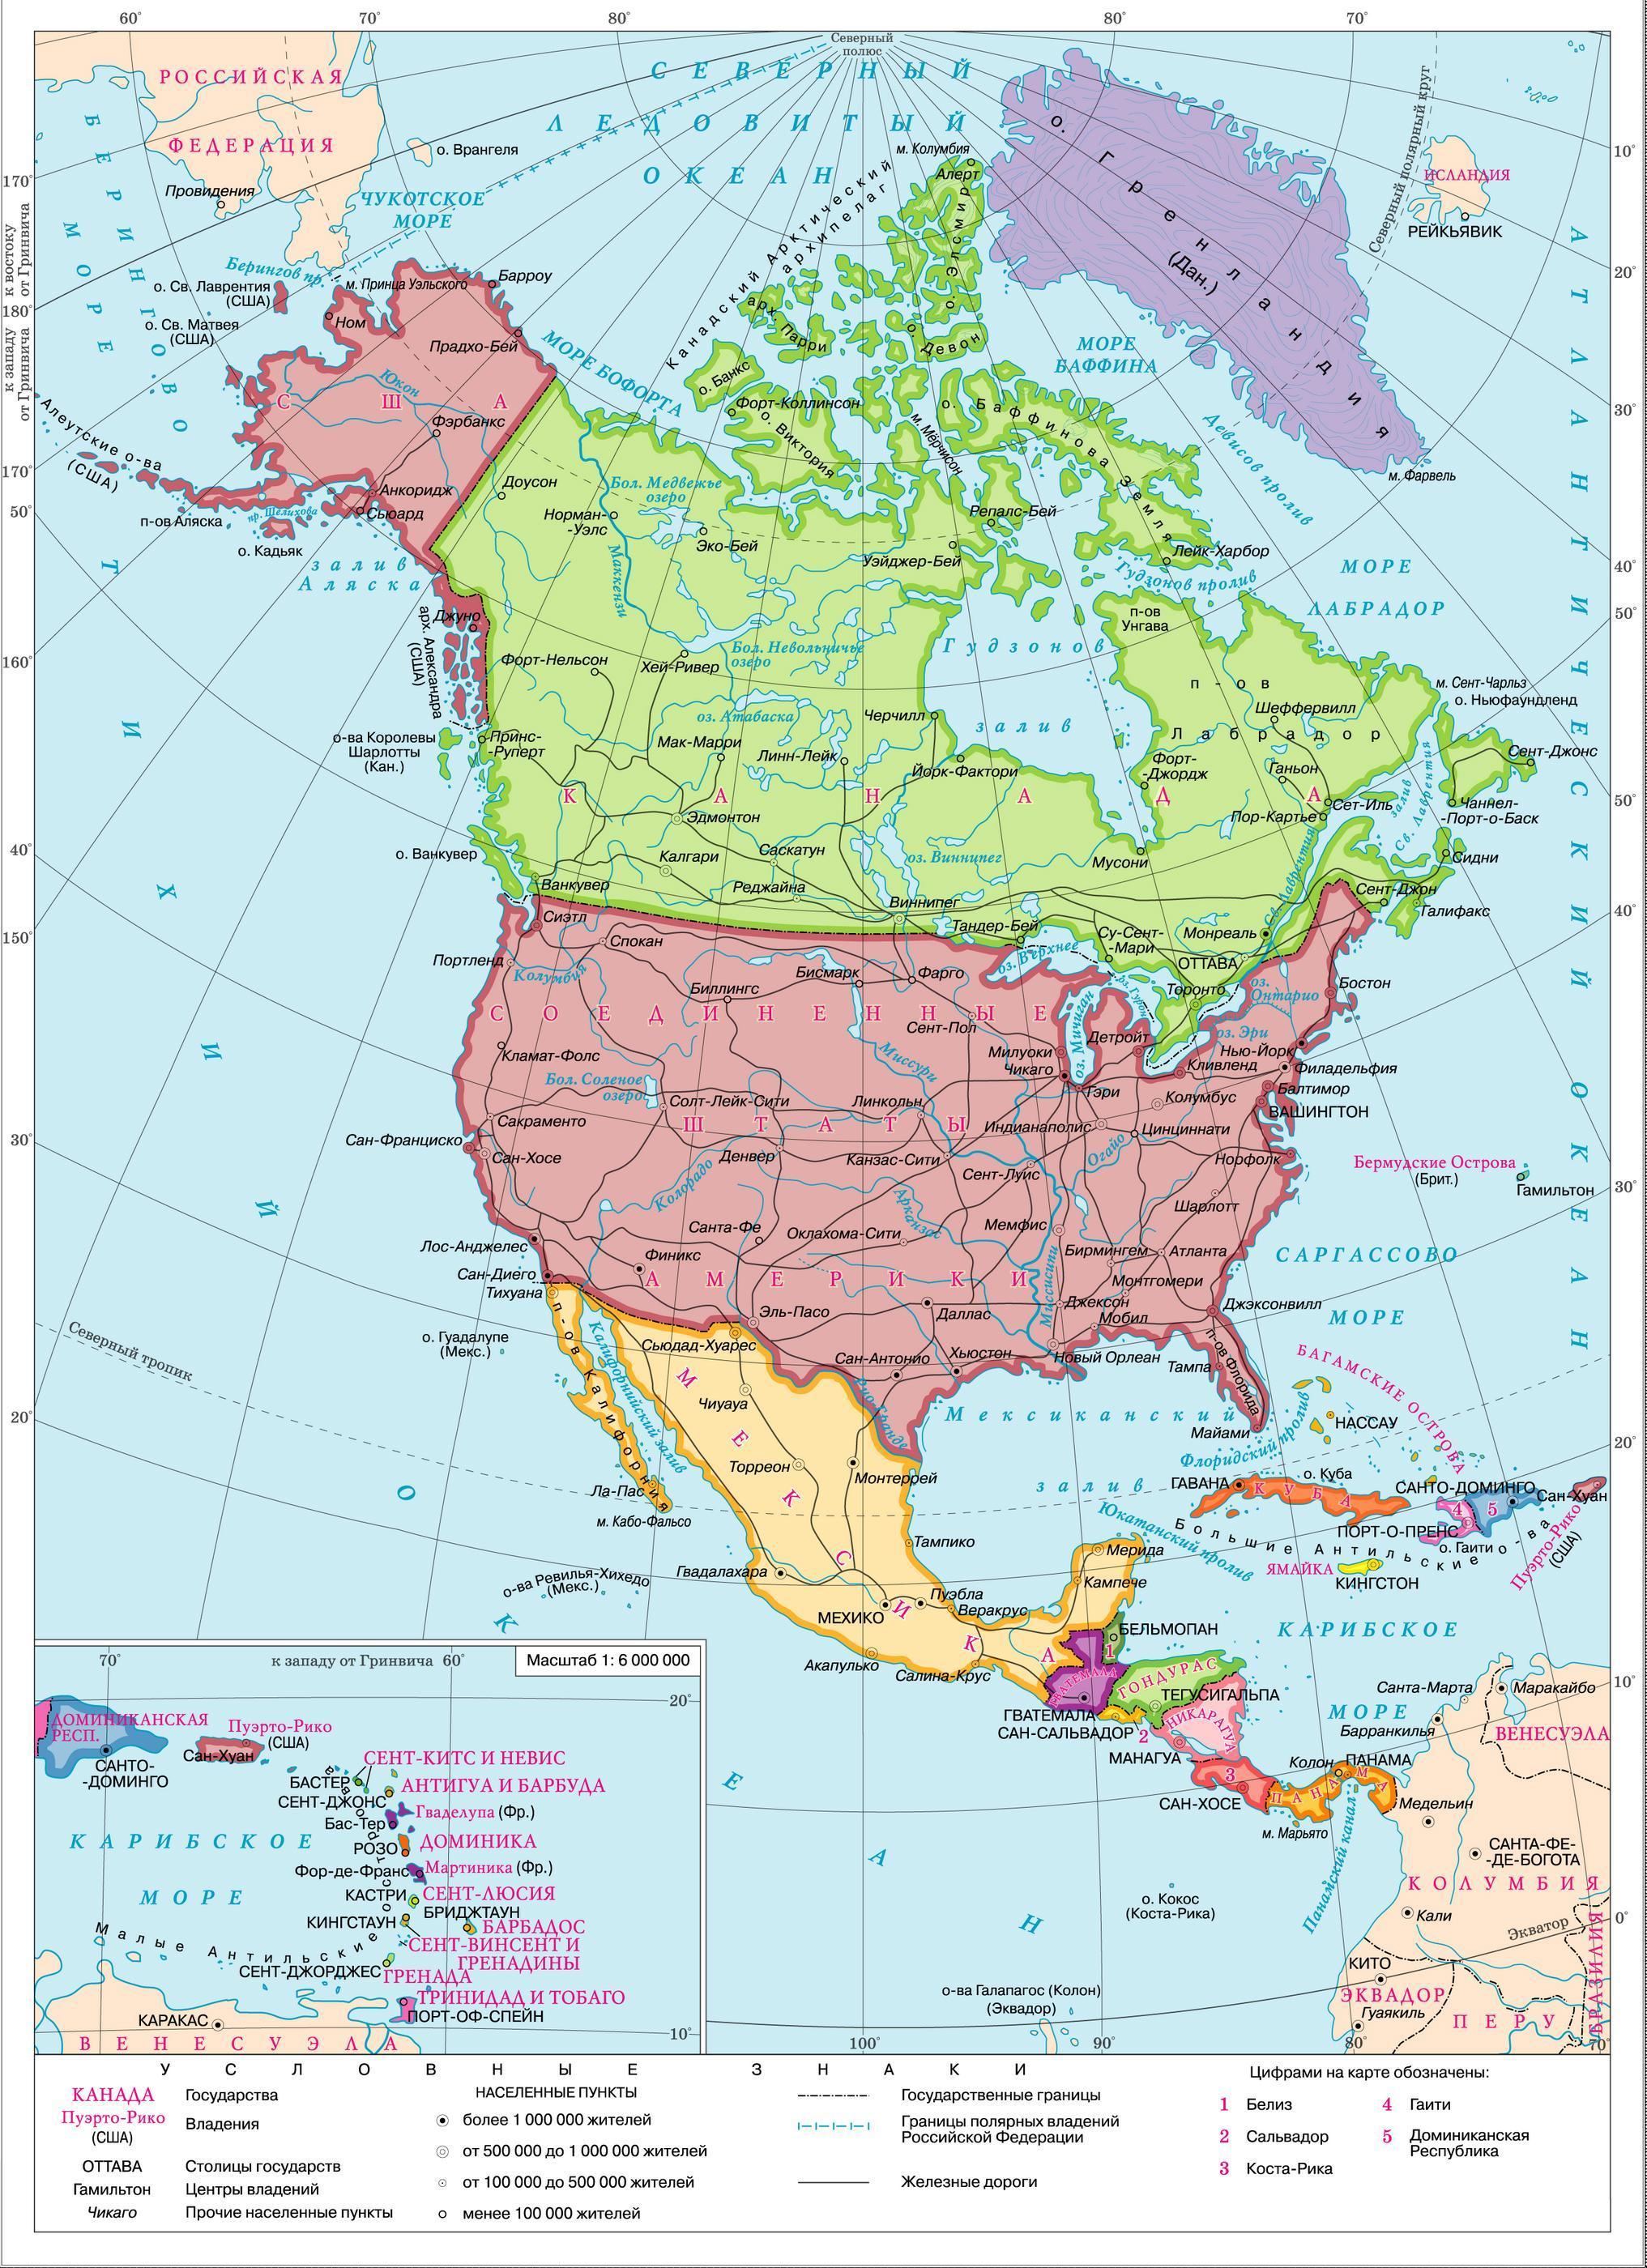 Доклад по материку северная америка 9567